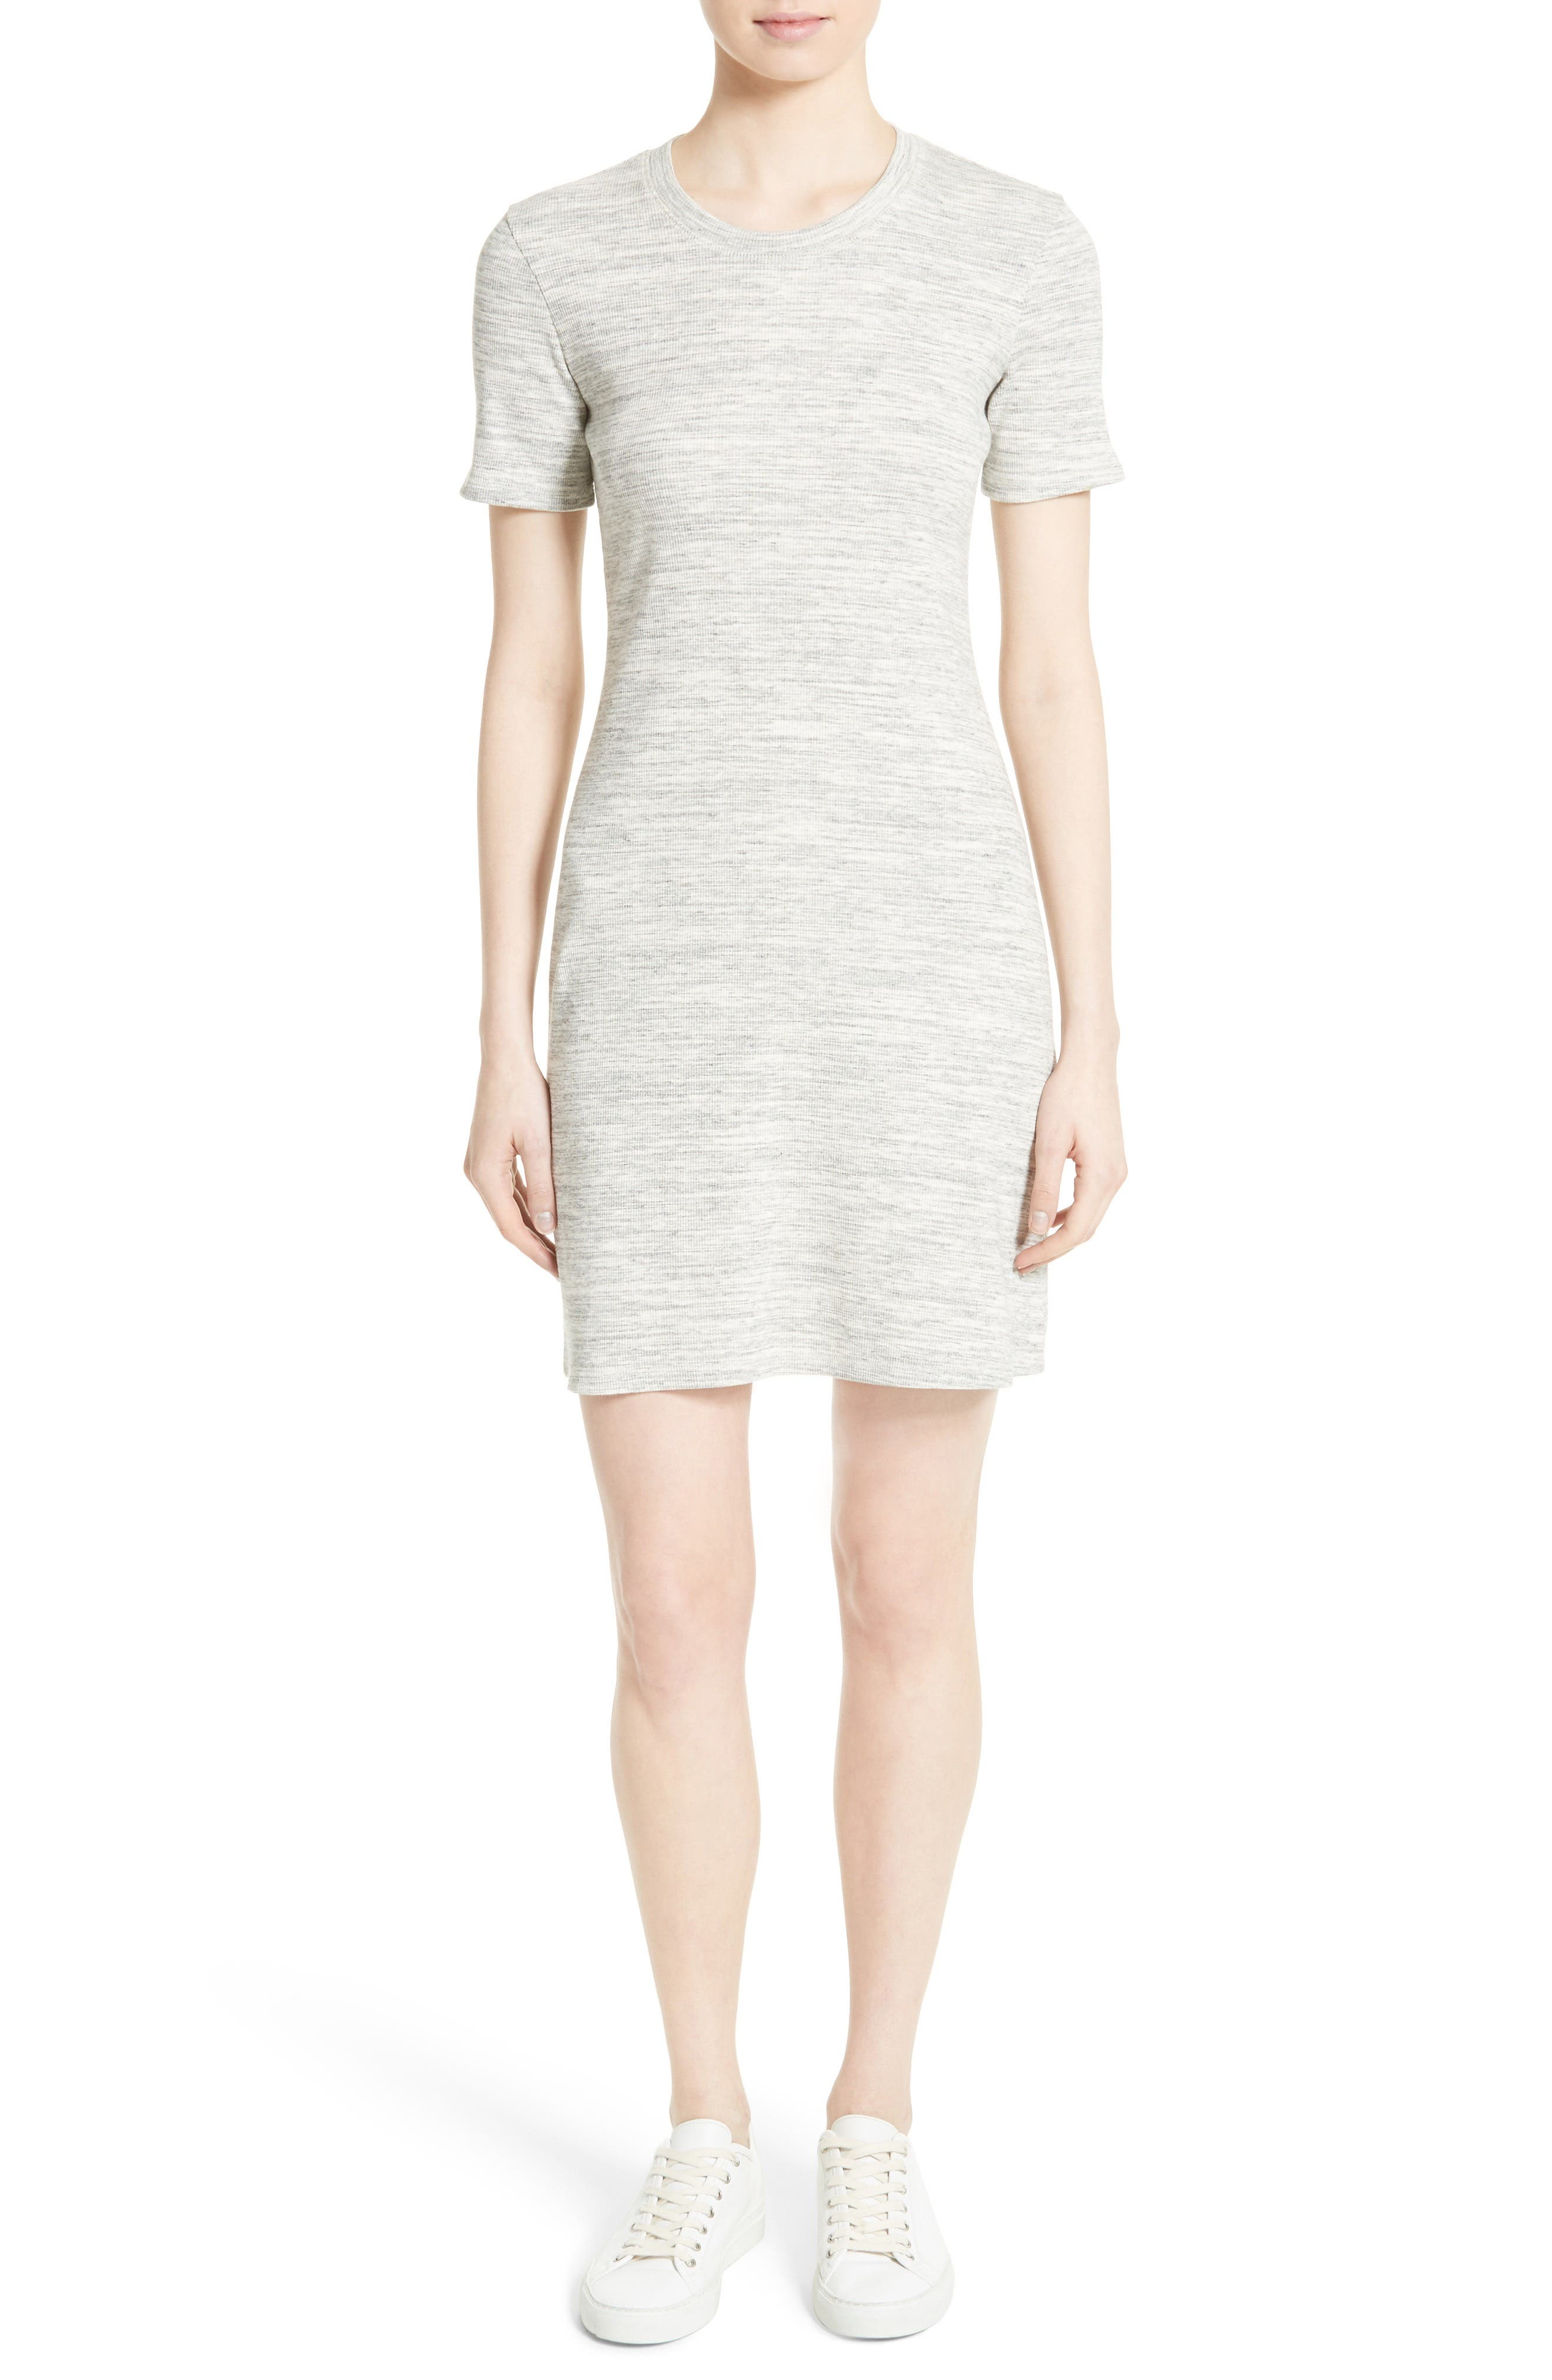 Theory Cherry B3 Sterling Rib Knit T-Shirt Dress